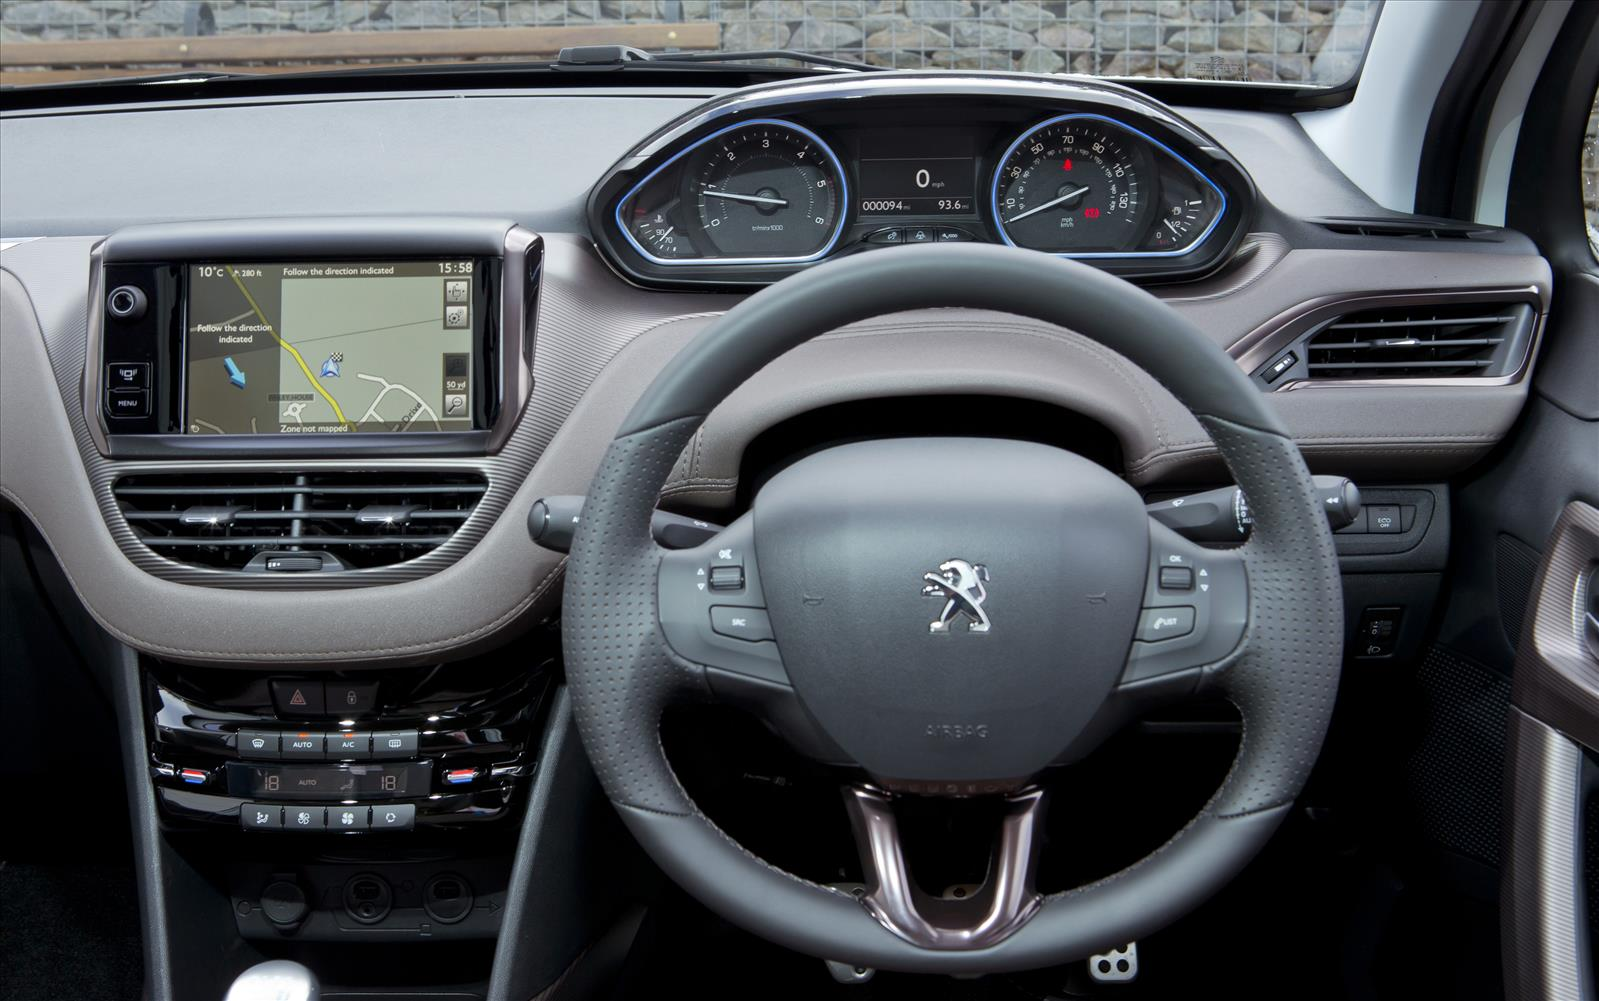 Peugeot 2008 2013 Instrument Panel